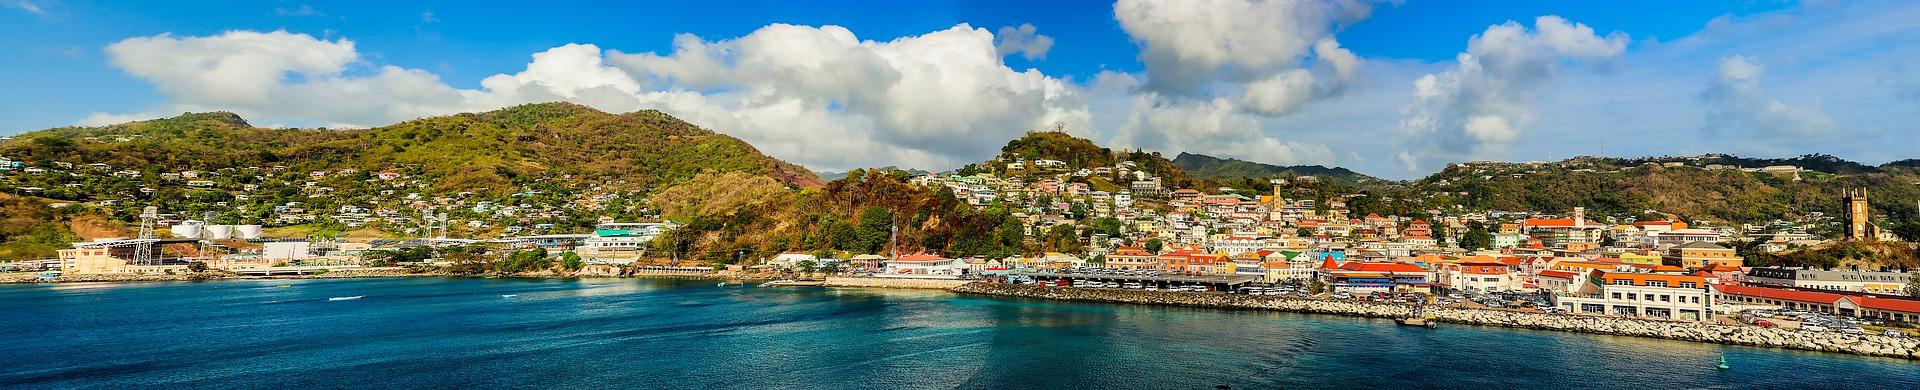 Гренада - кулинарная столица